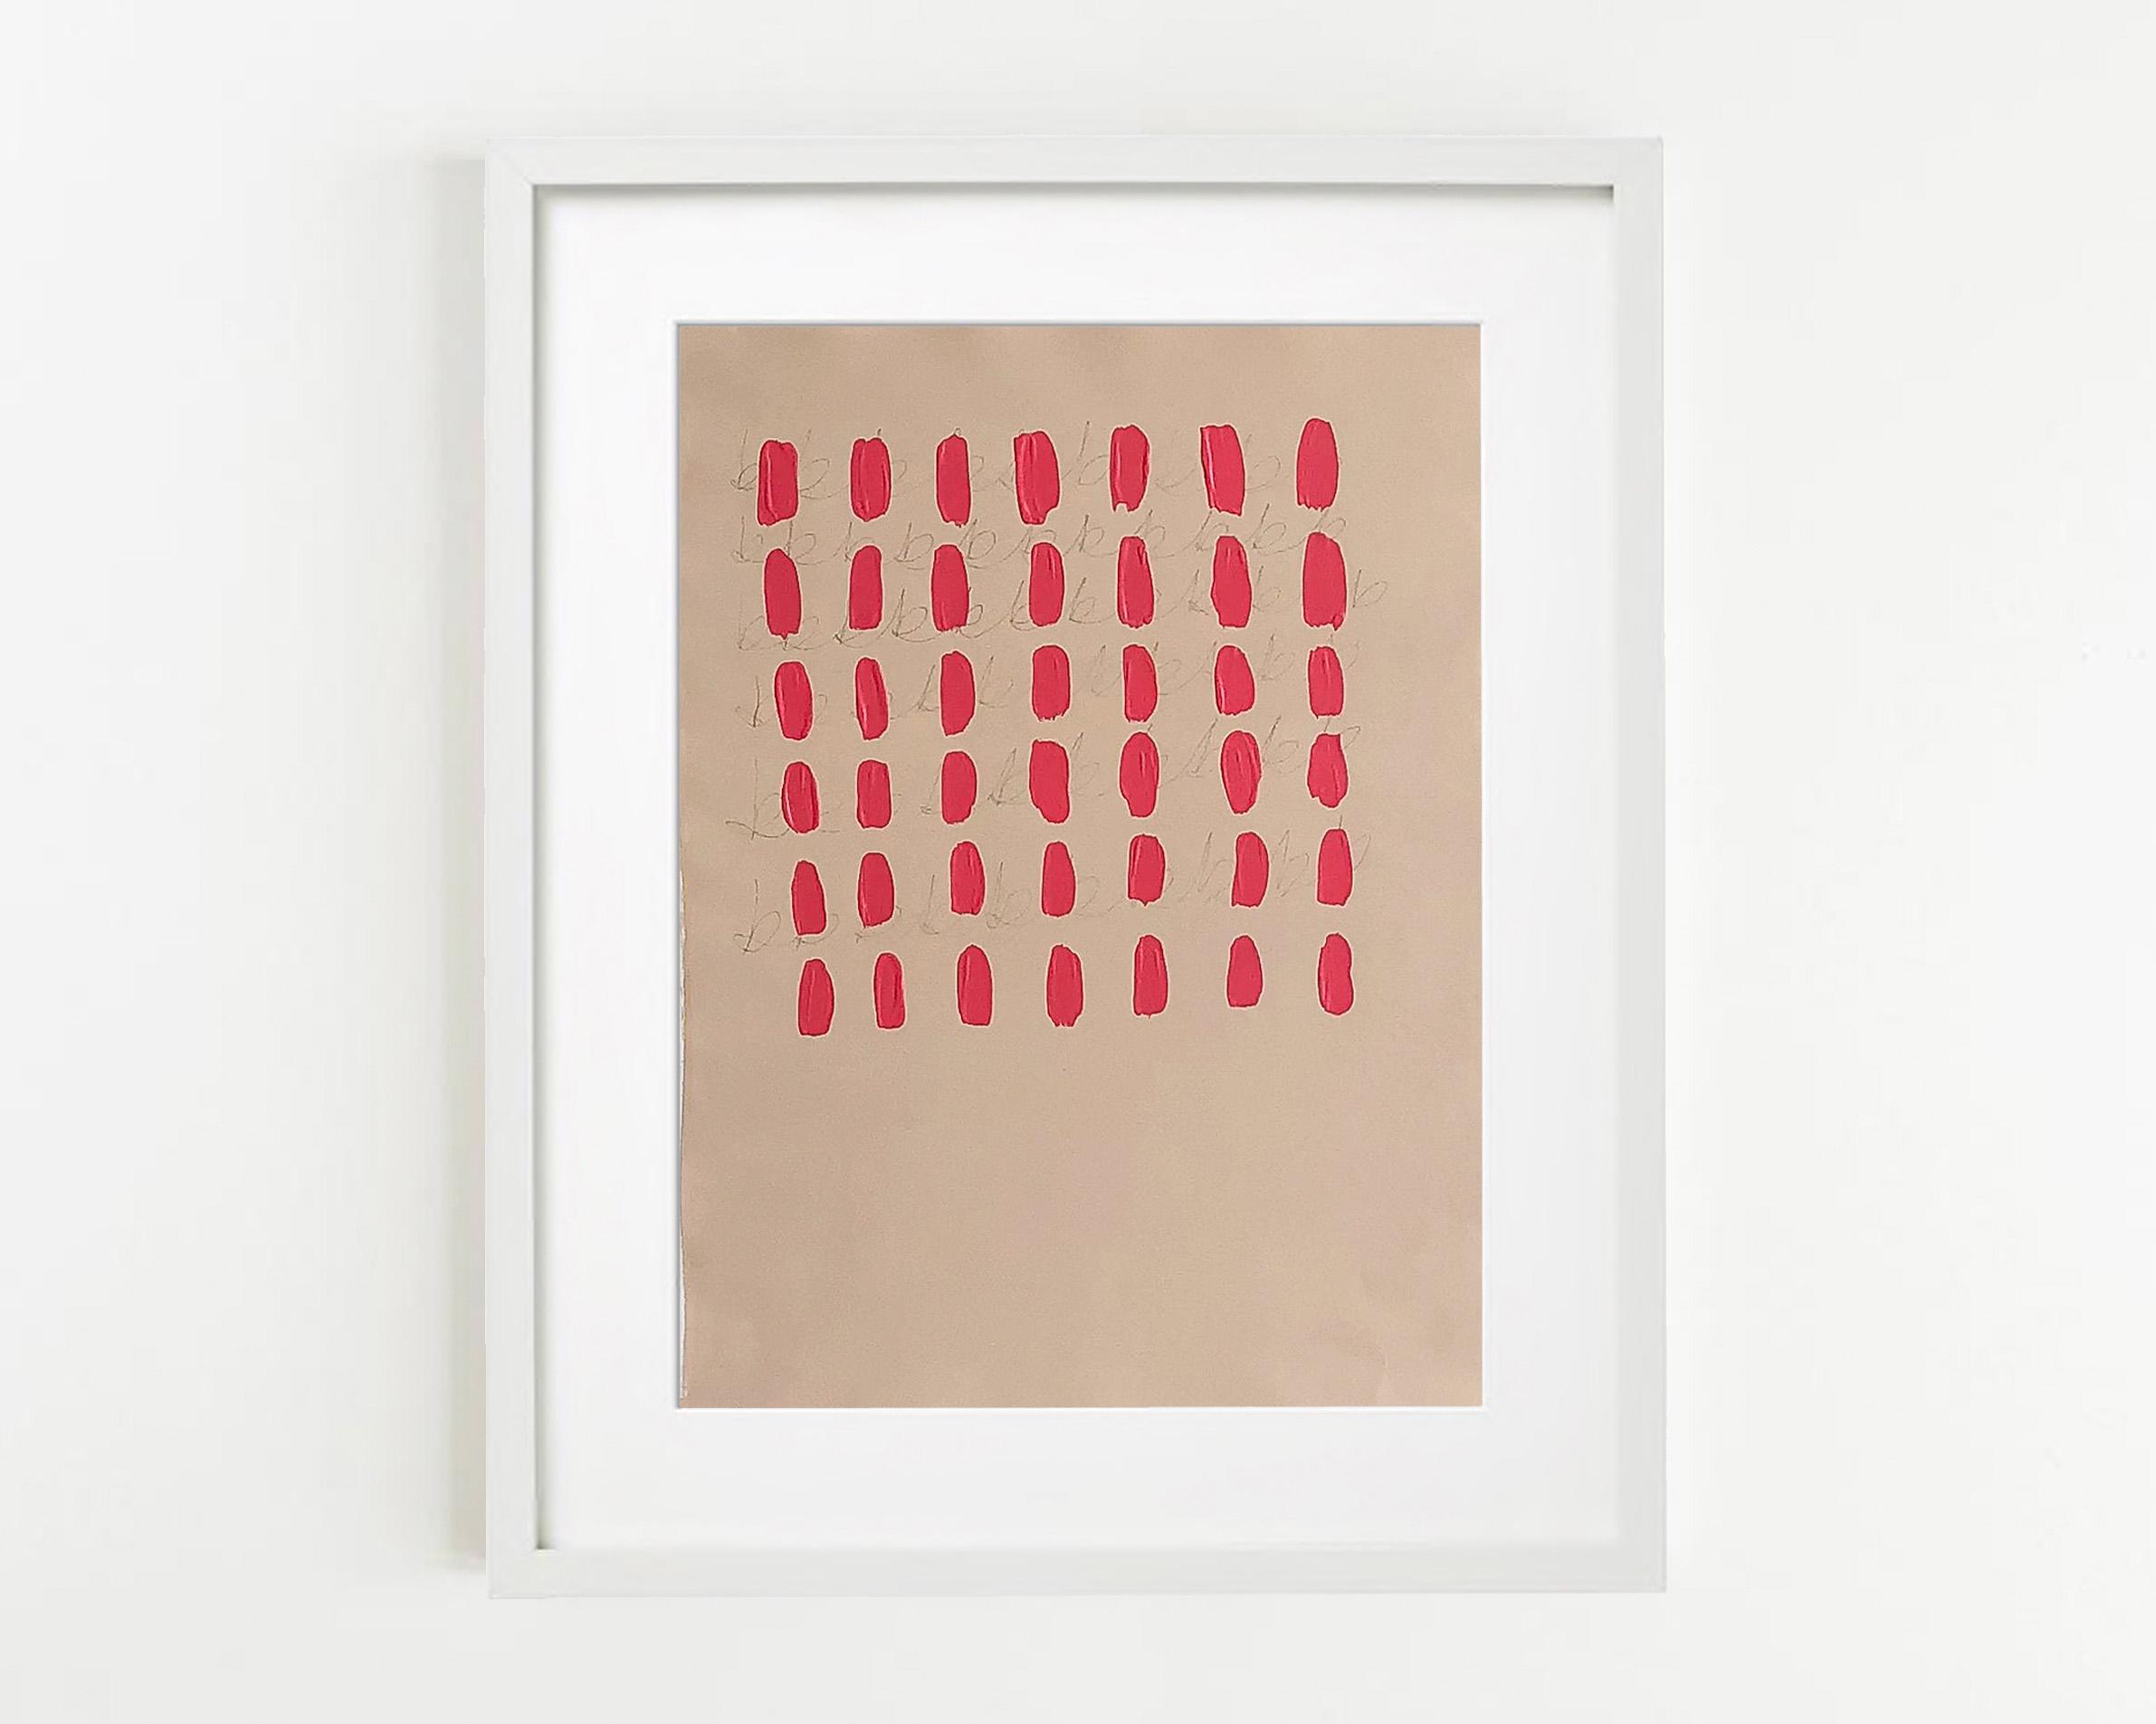 Abstract Dot Artwork £39.90